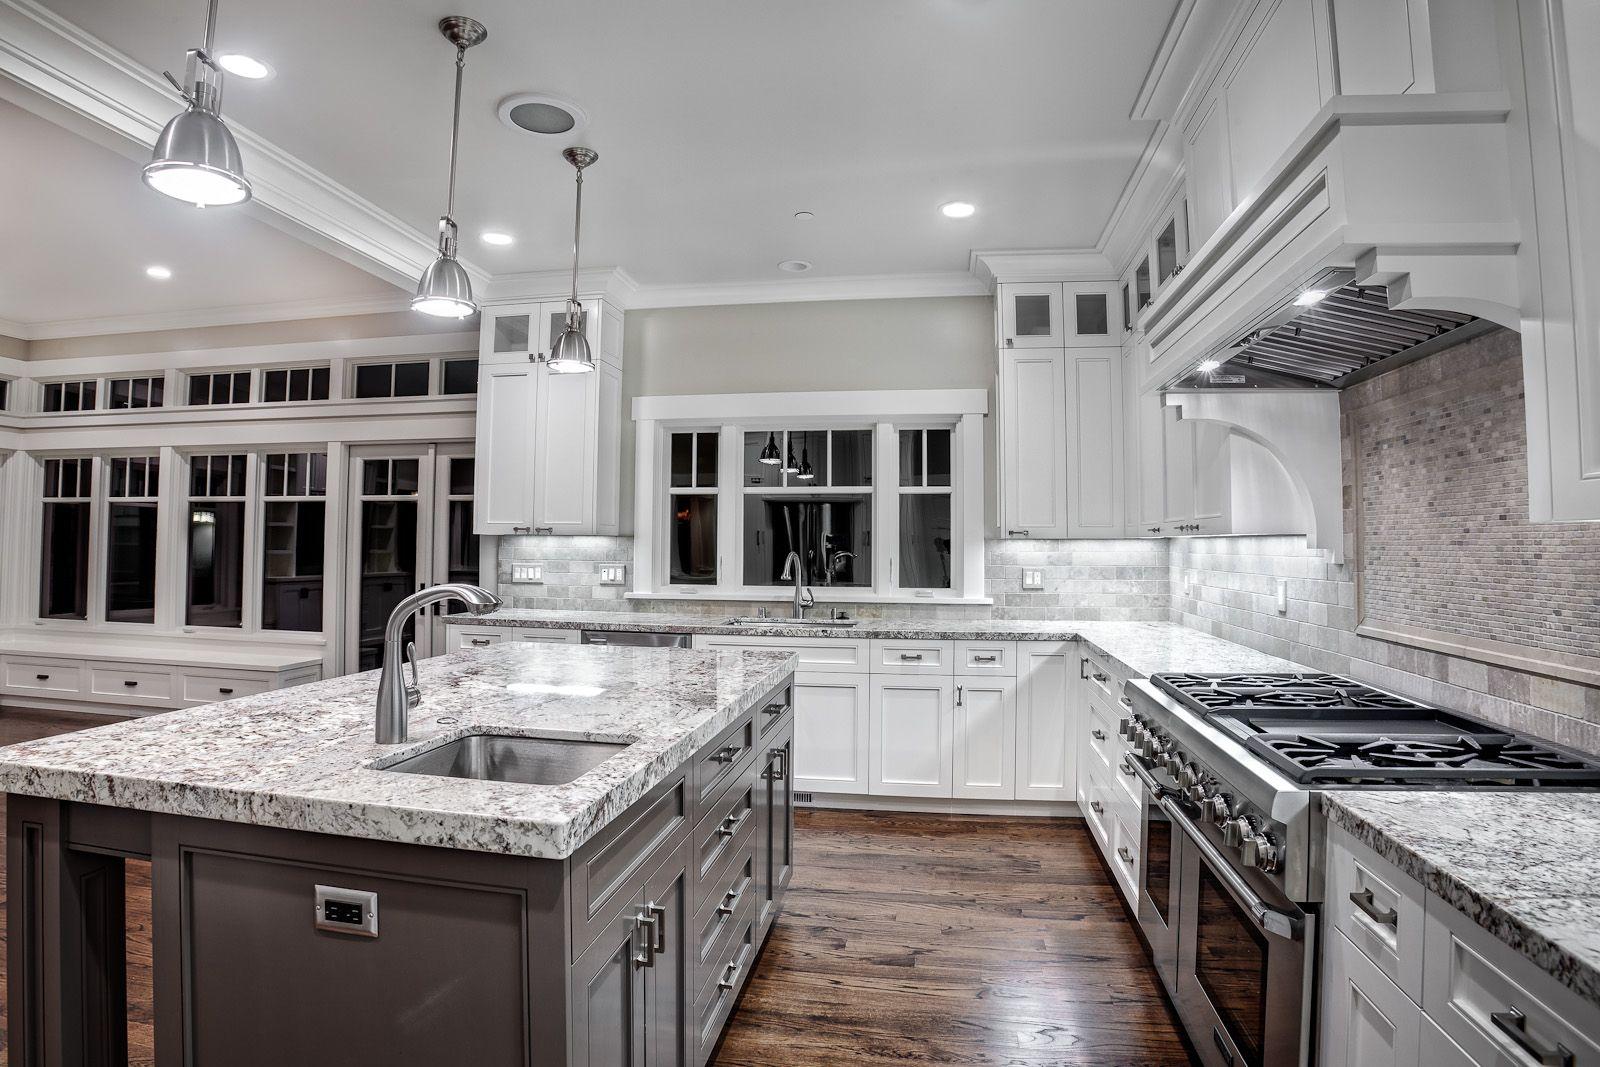 Furniture Semi Custom Kitchen Cabinets Give Attractive Custom Look At A Cheap Price Co White Granite Countertops Kitchen Cabinet Design Grey Kitchen Cabinets